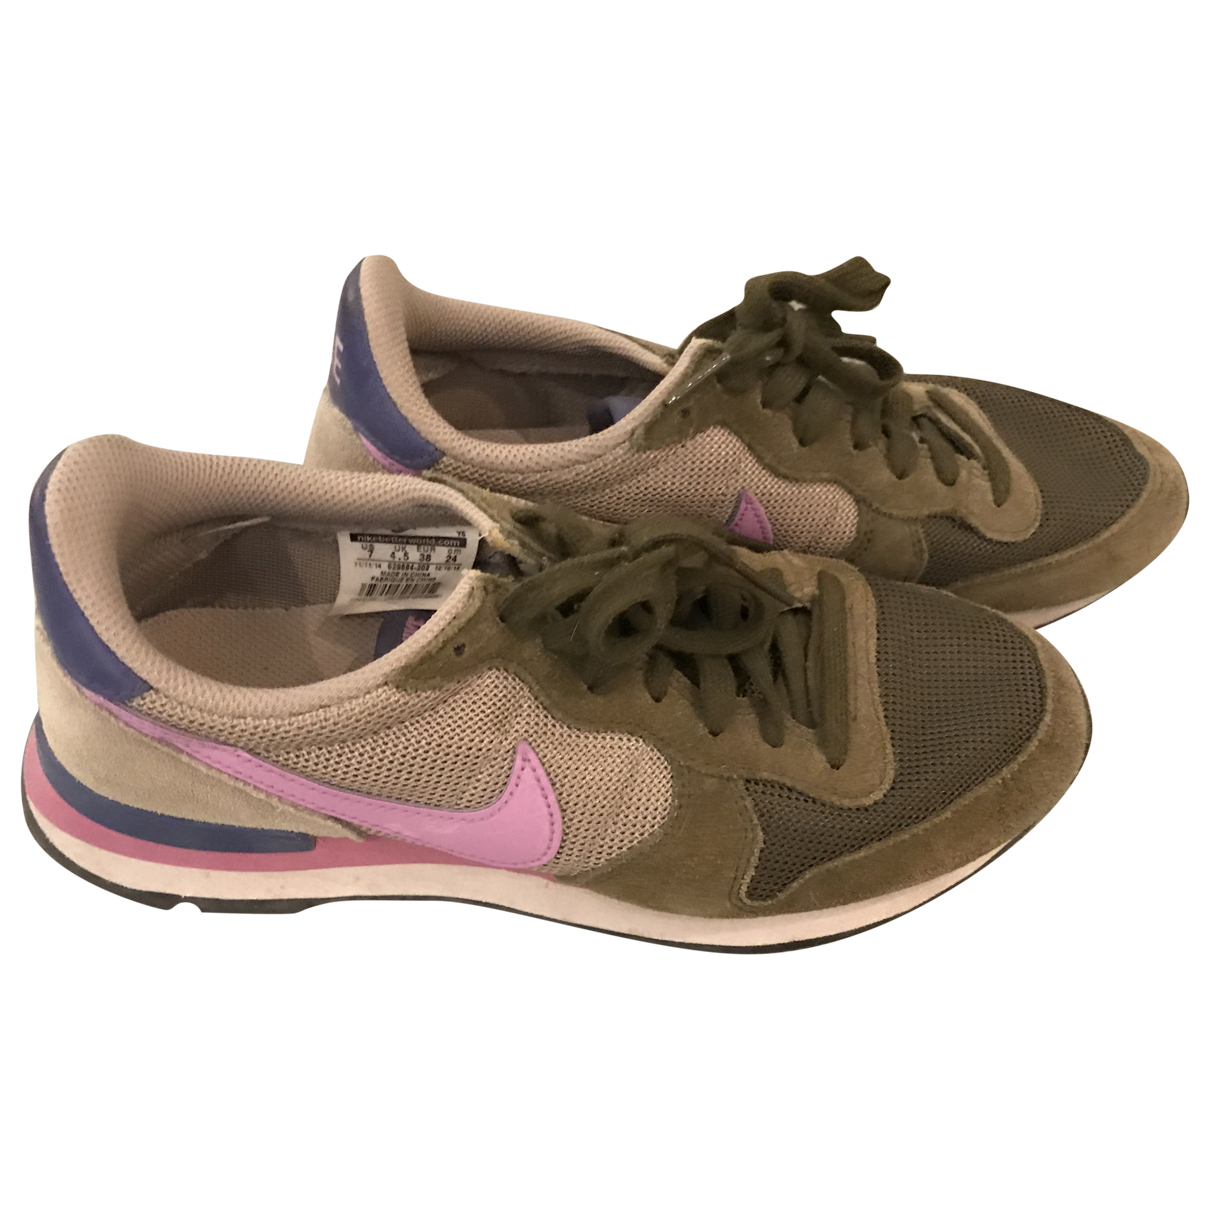 Nike Internationalist Multicolour Cloth Trainers for Women 38 EU